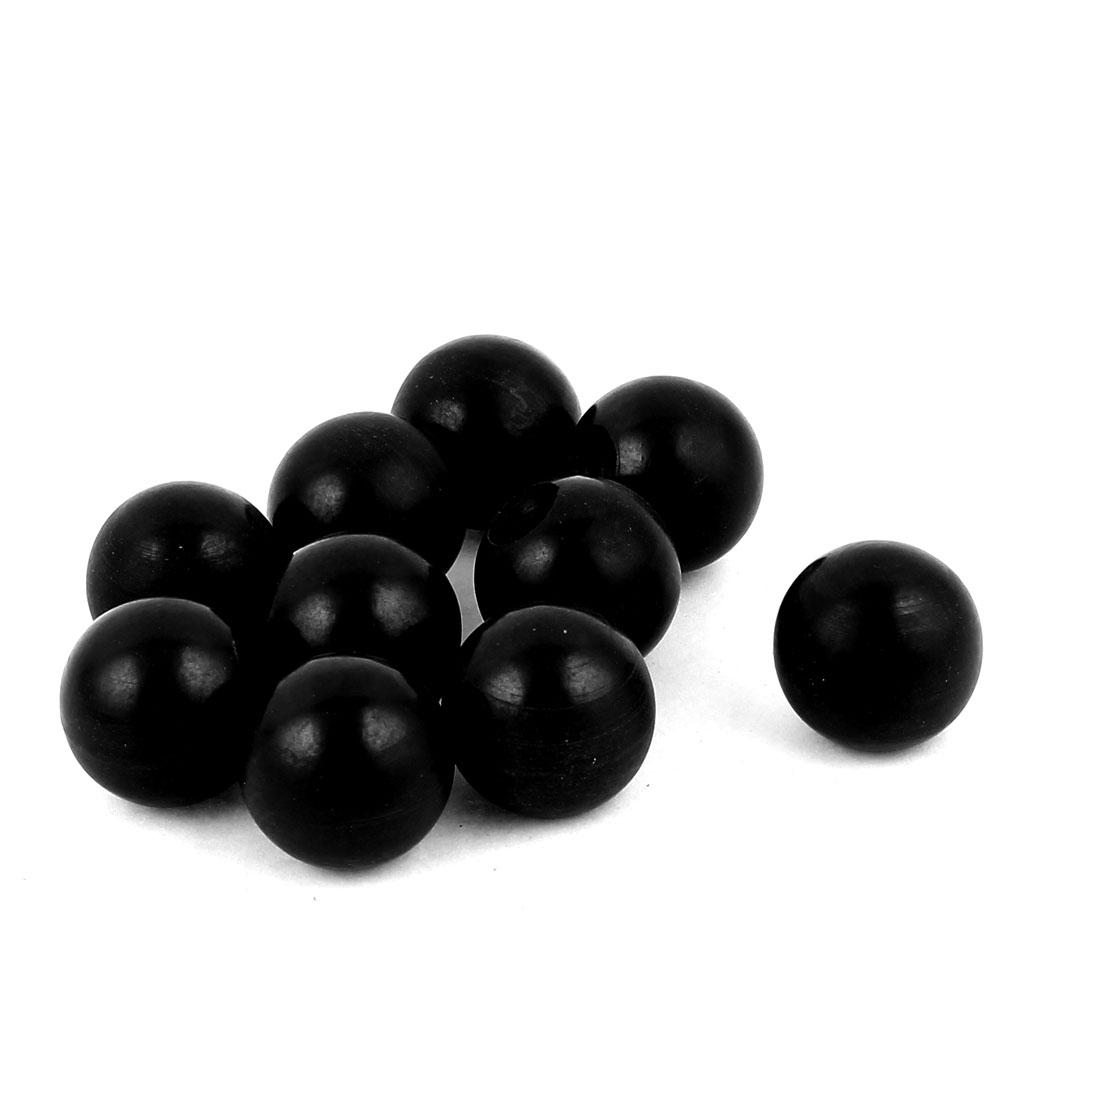 10pcs M6 Female Thread Black Plastic Solid Ball Lever Handle Knob